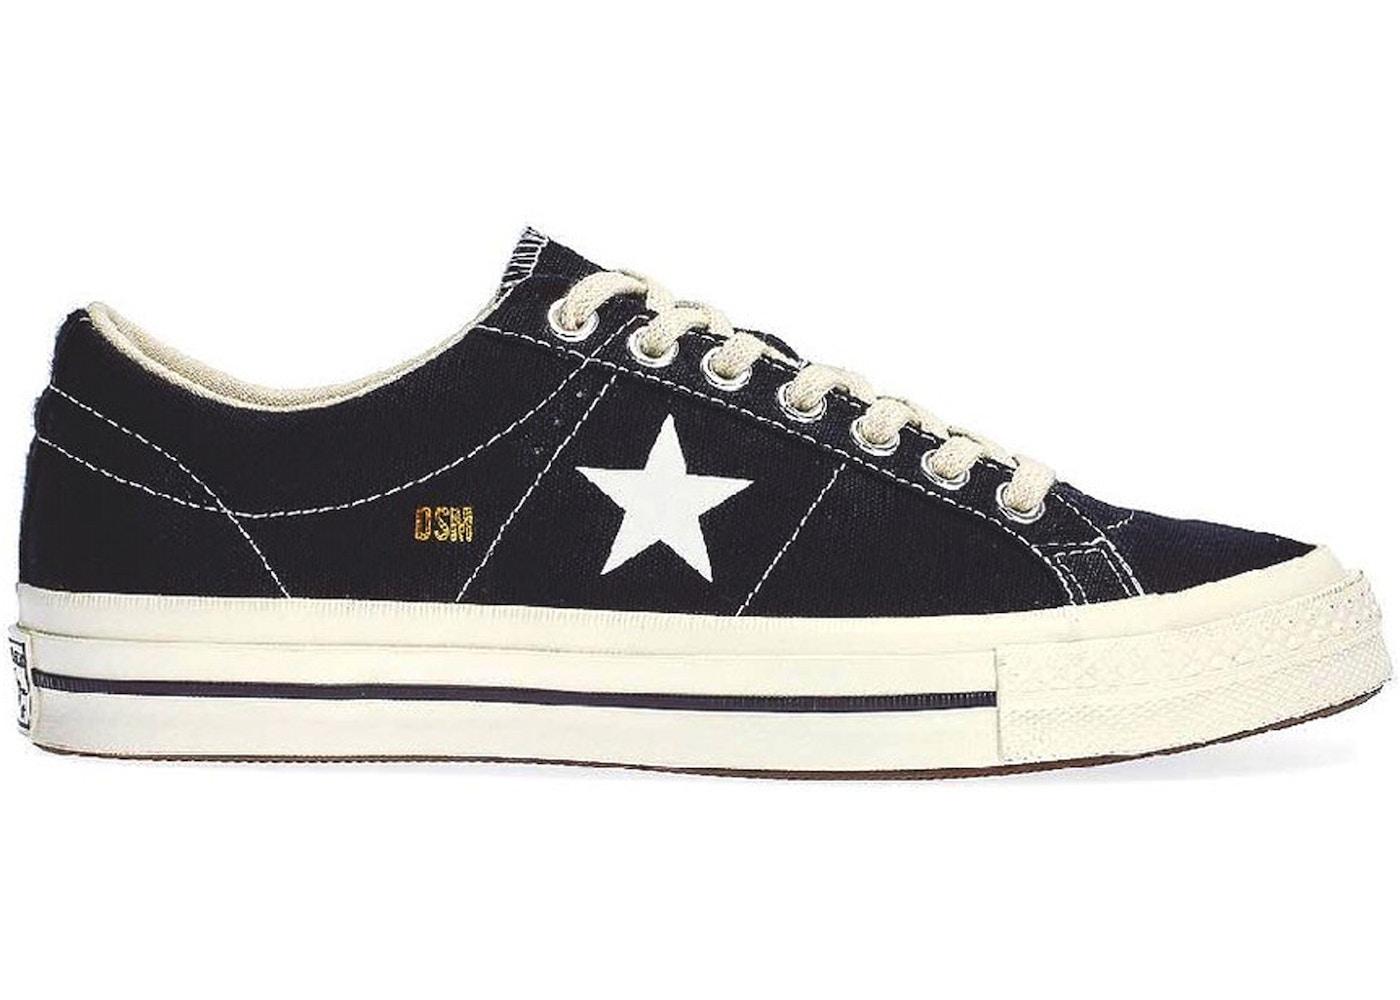 converse one star canvas